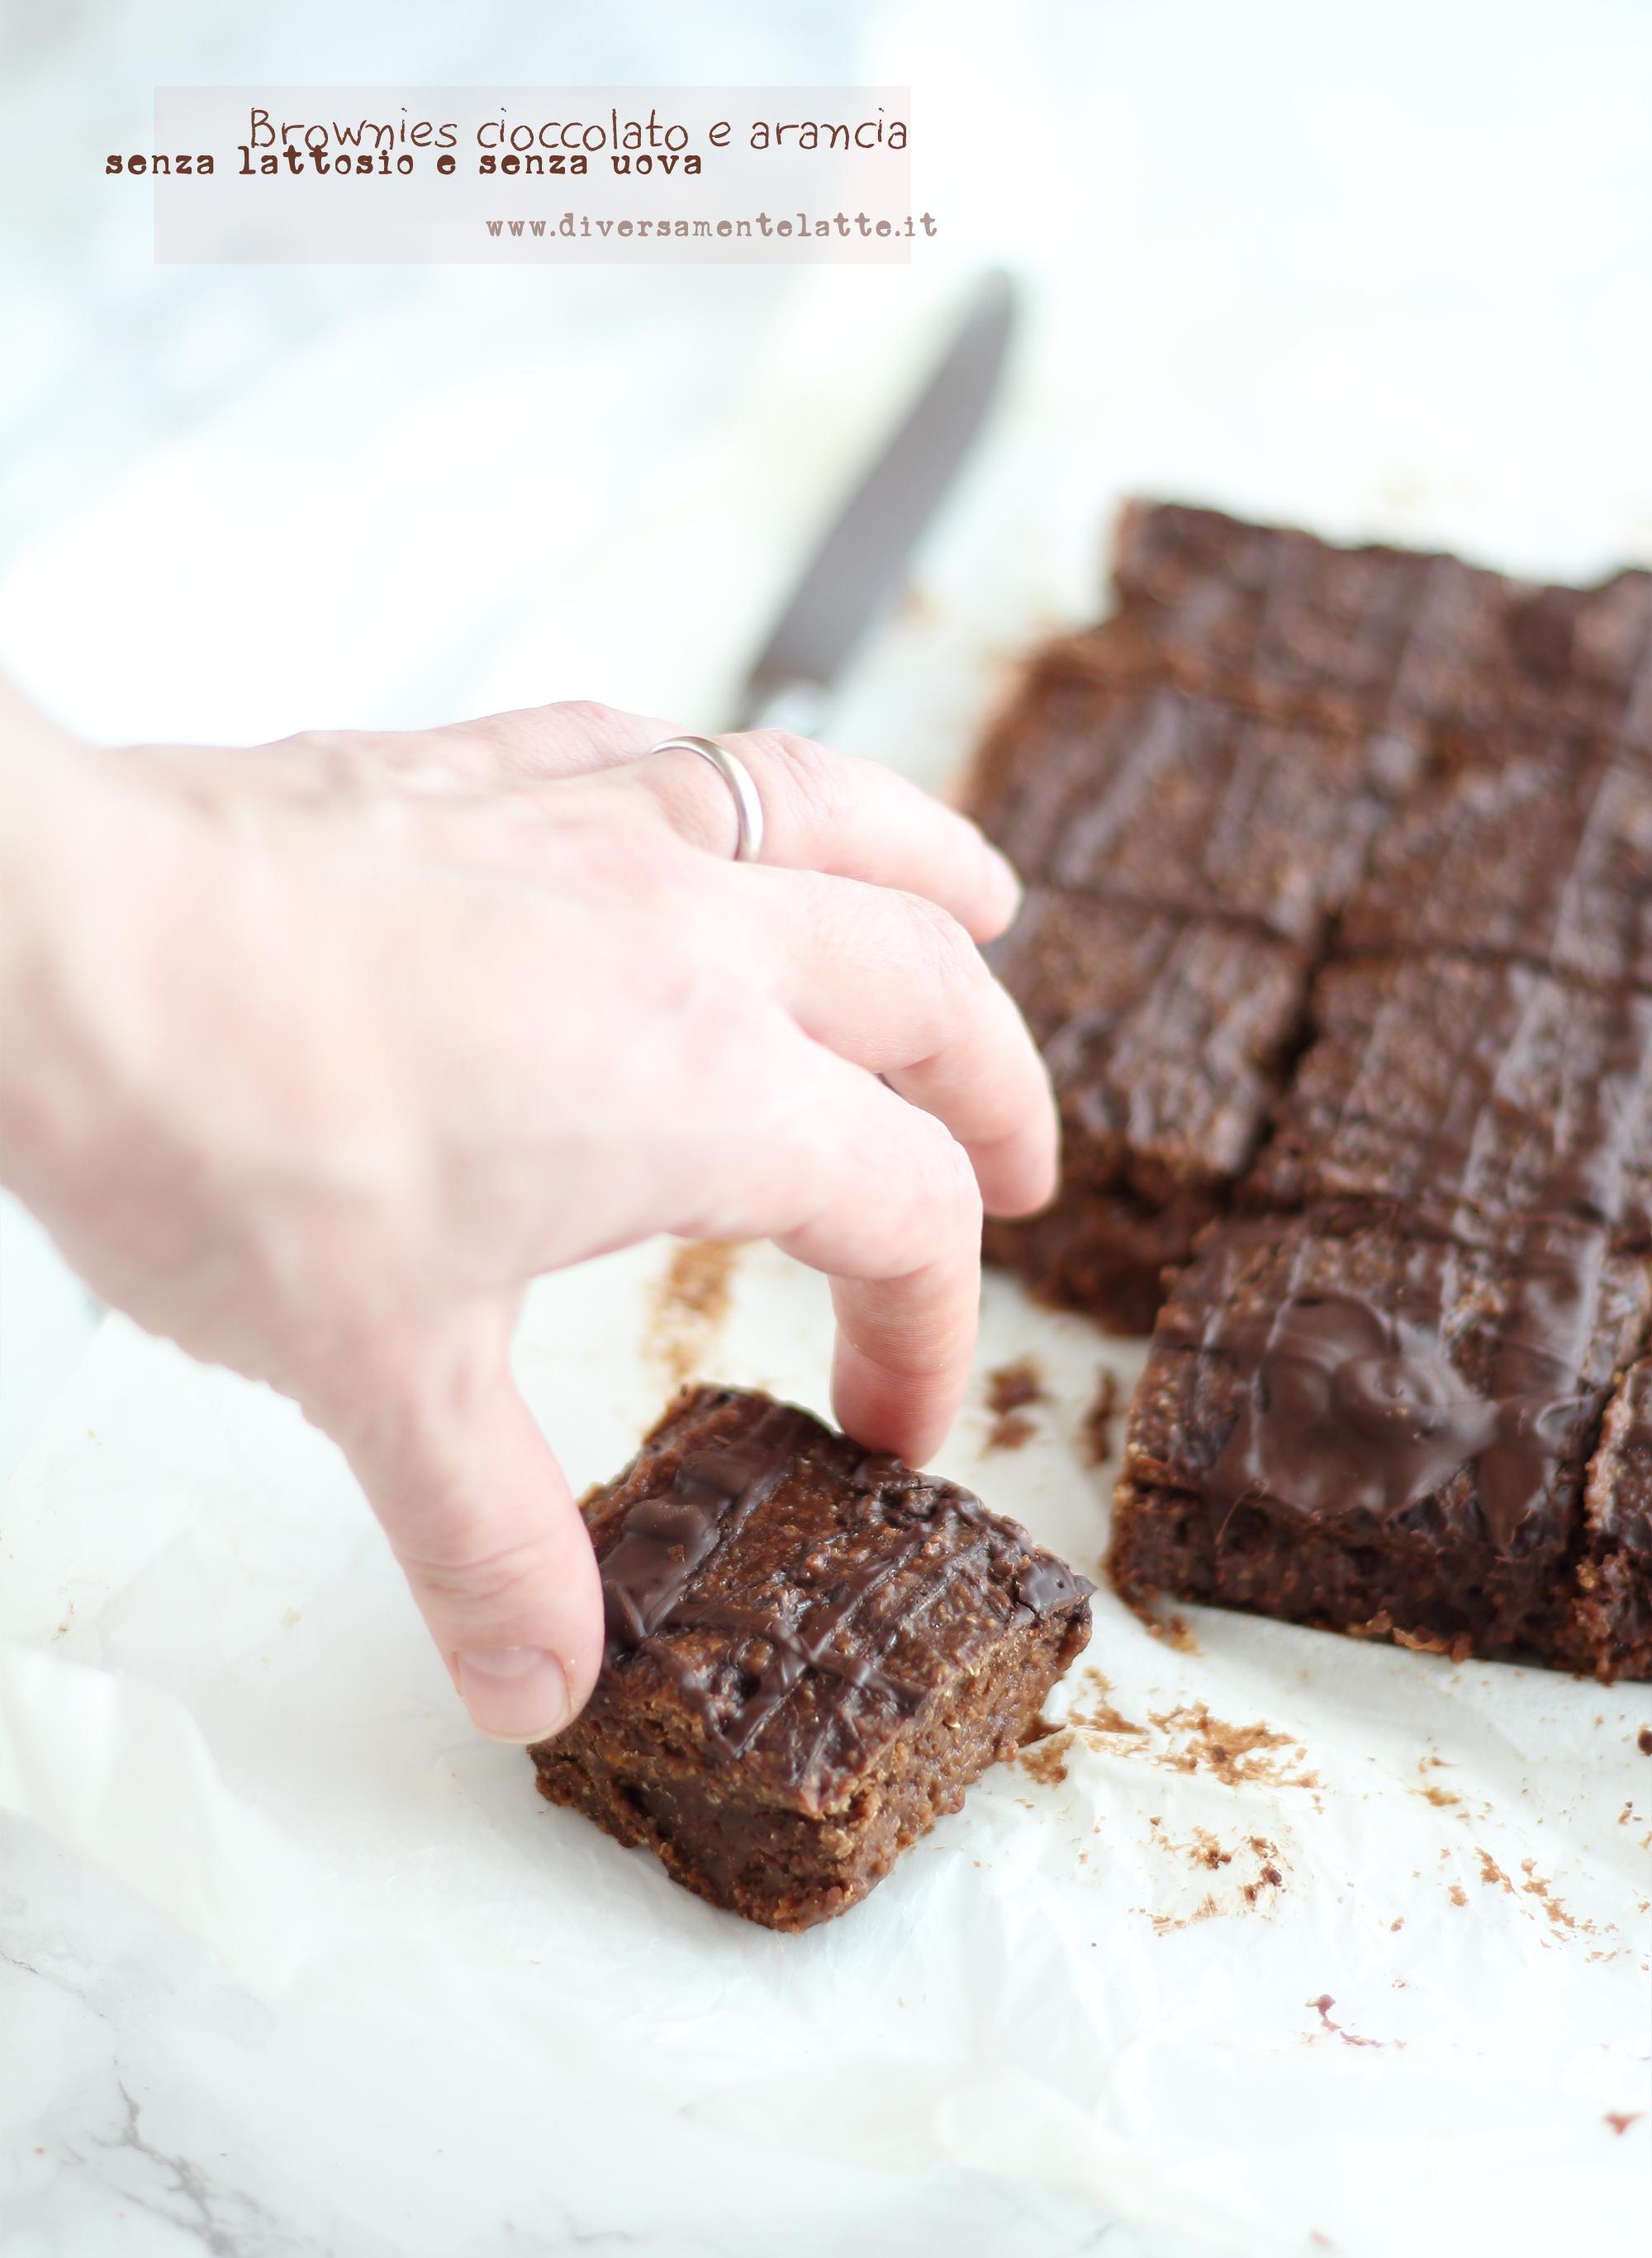 brownies cioccolato arancia senza lattosio